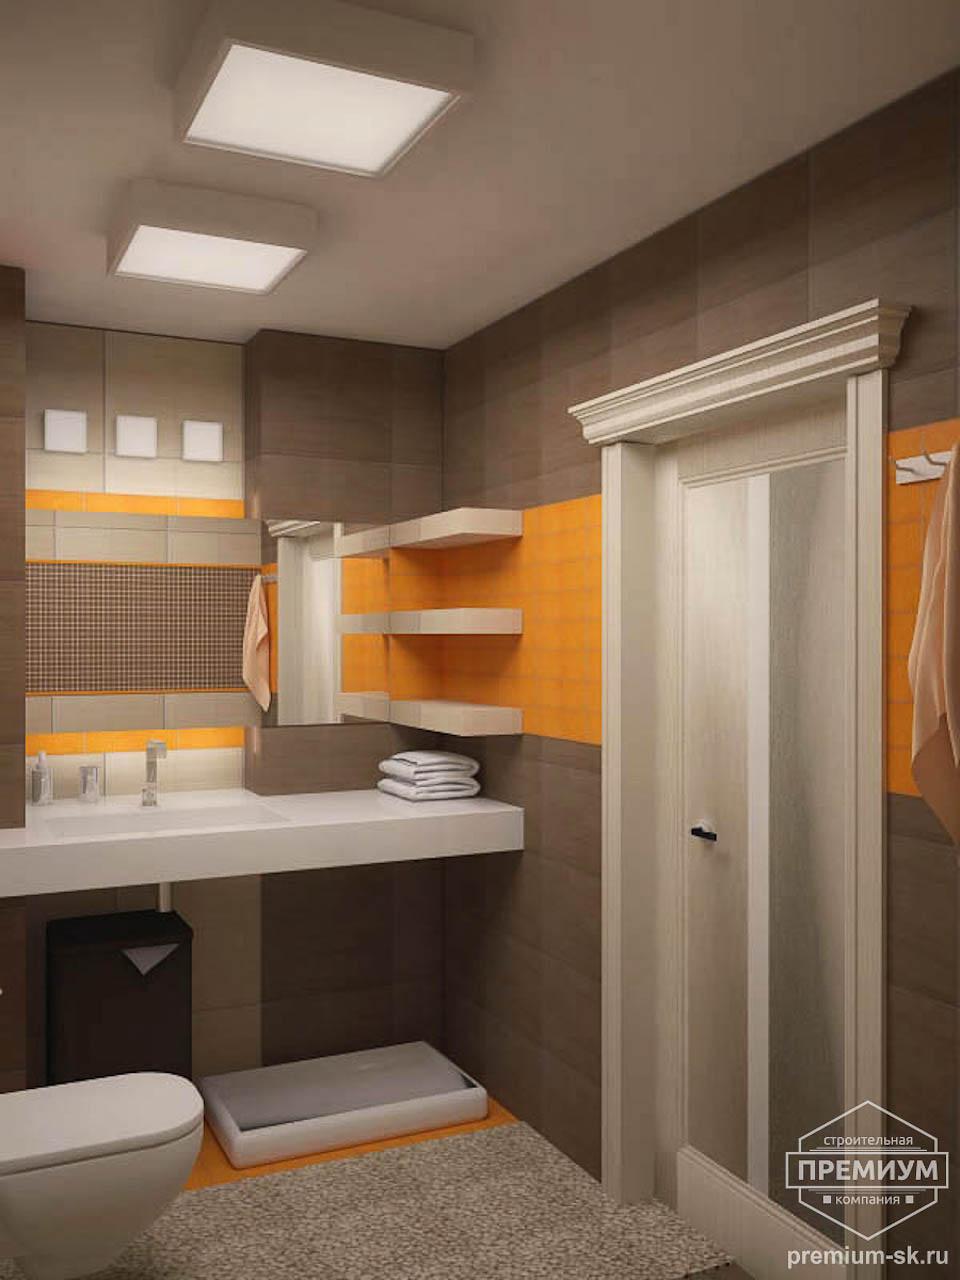 Дизайн интерьера однокомнатной квартиры по ул. Сыромолотова 11 img530090877